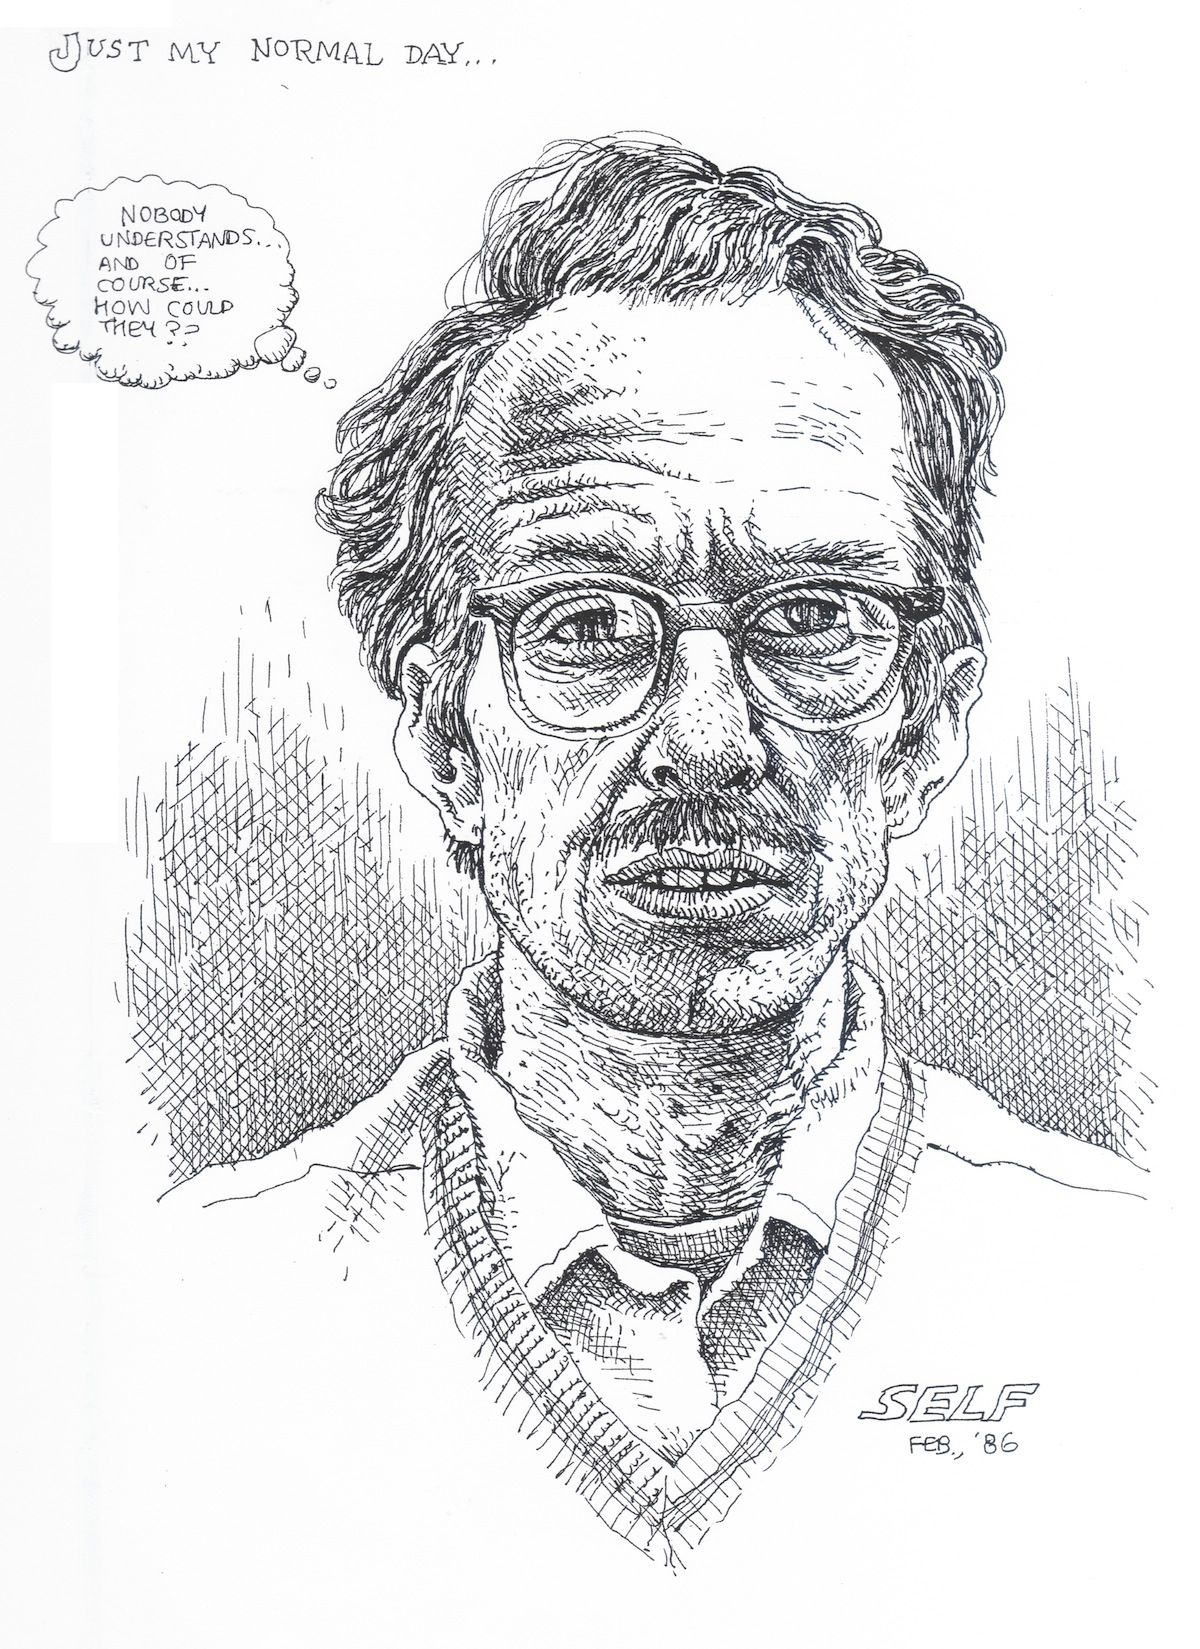 1200x1649 Variations Of R. Crumb Robert Crumb, Illustrations And Drawings